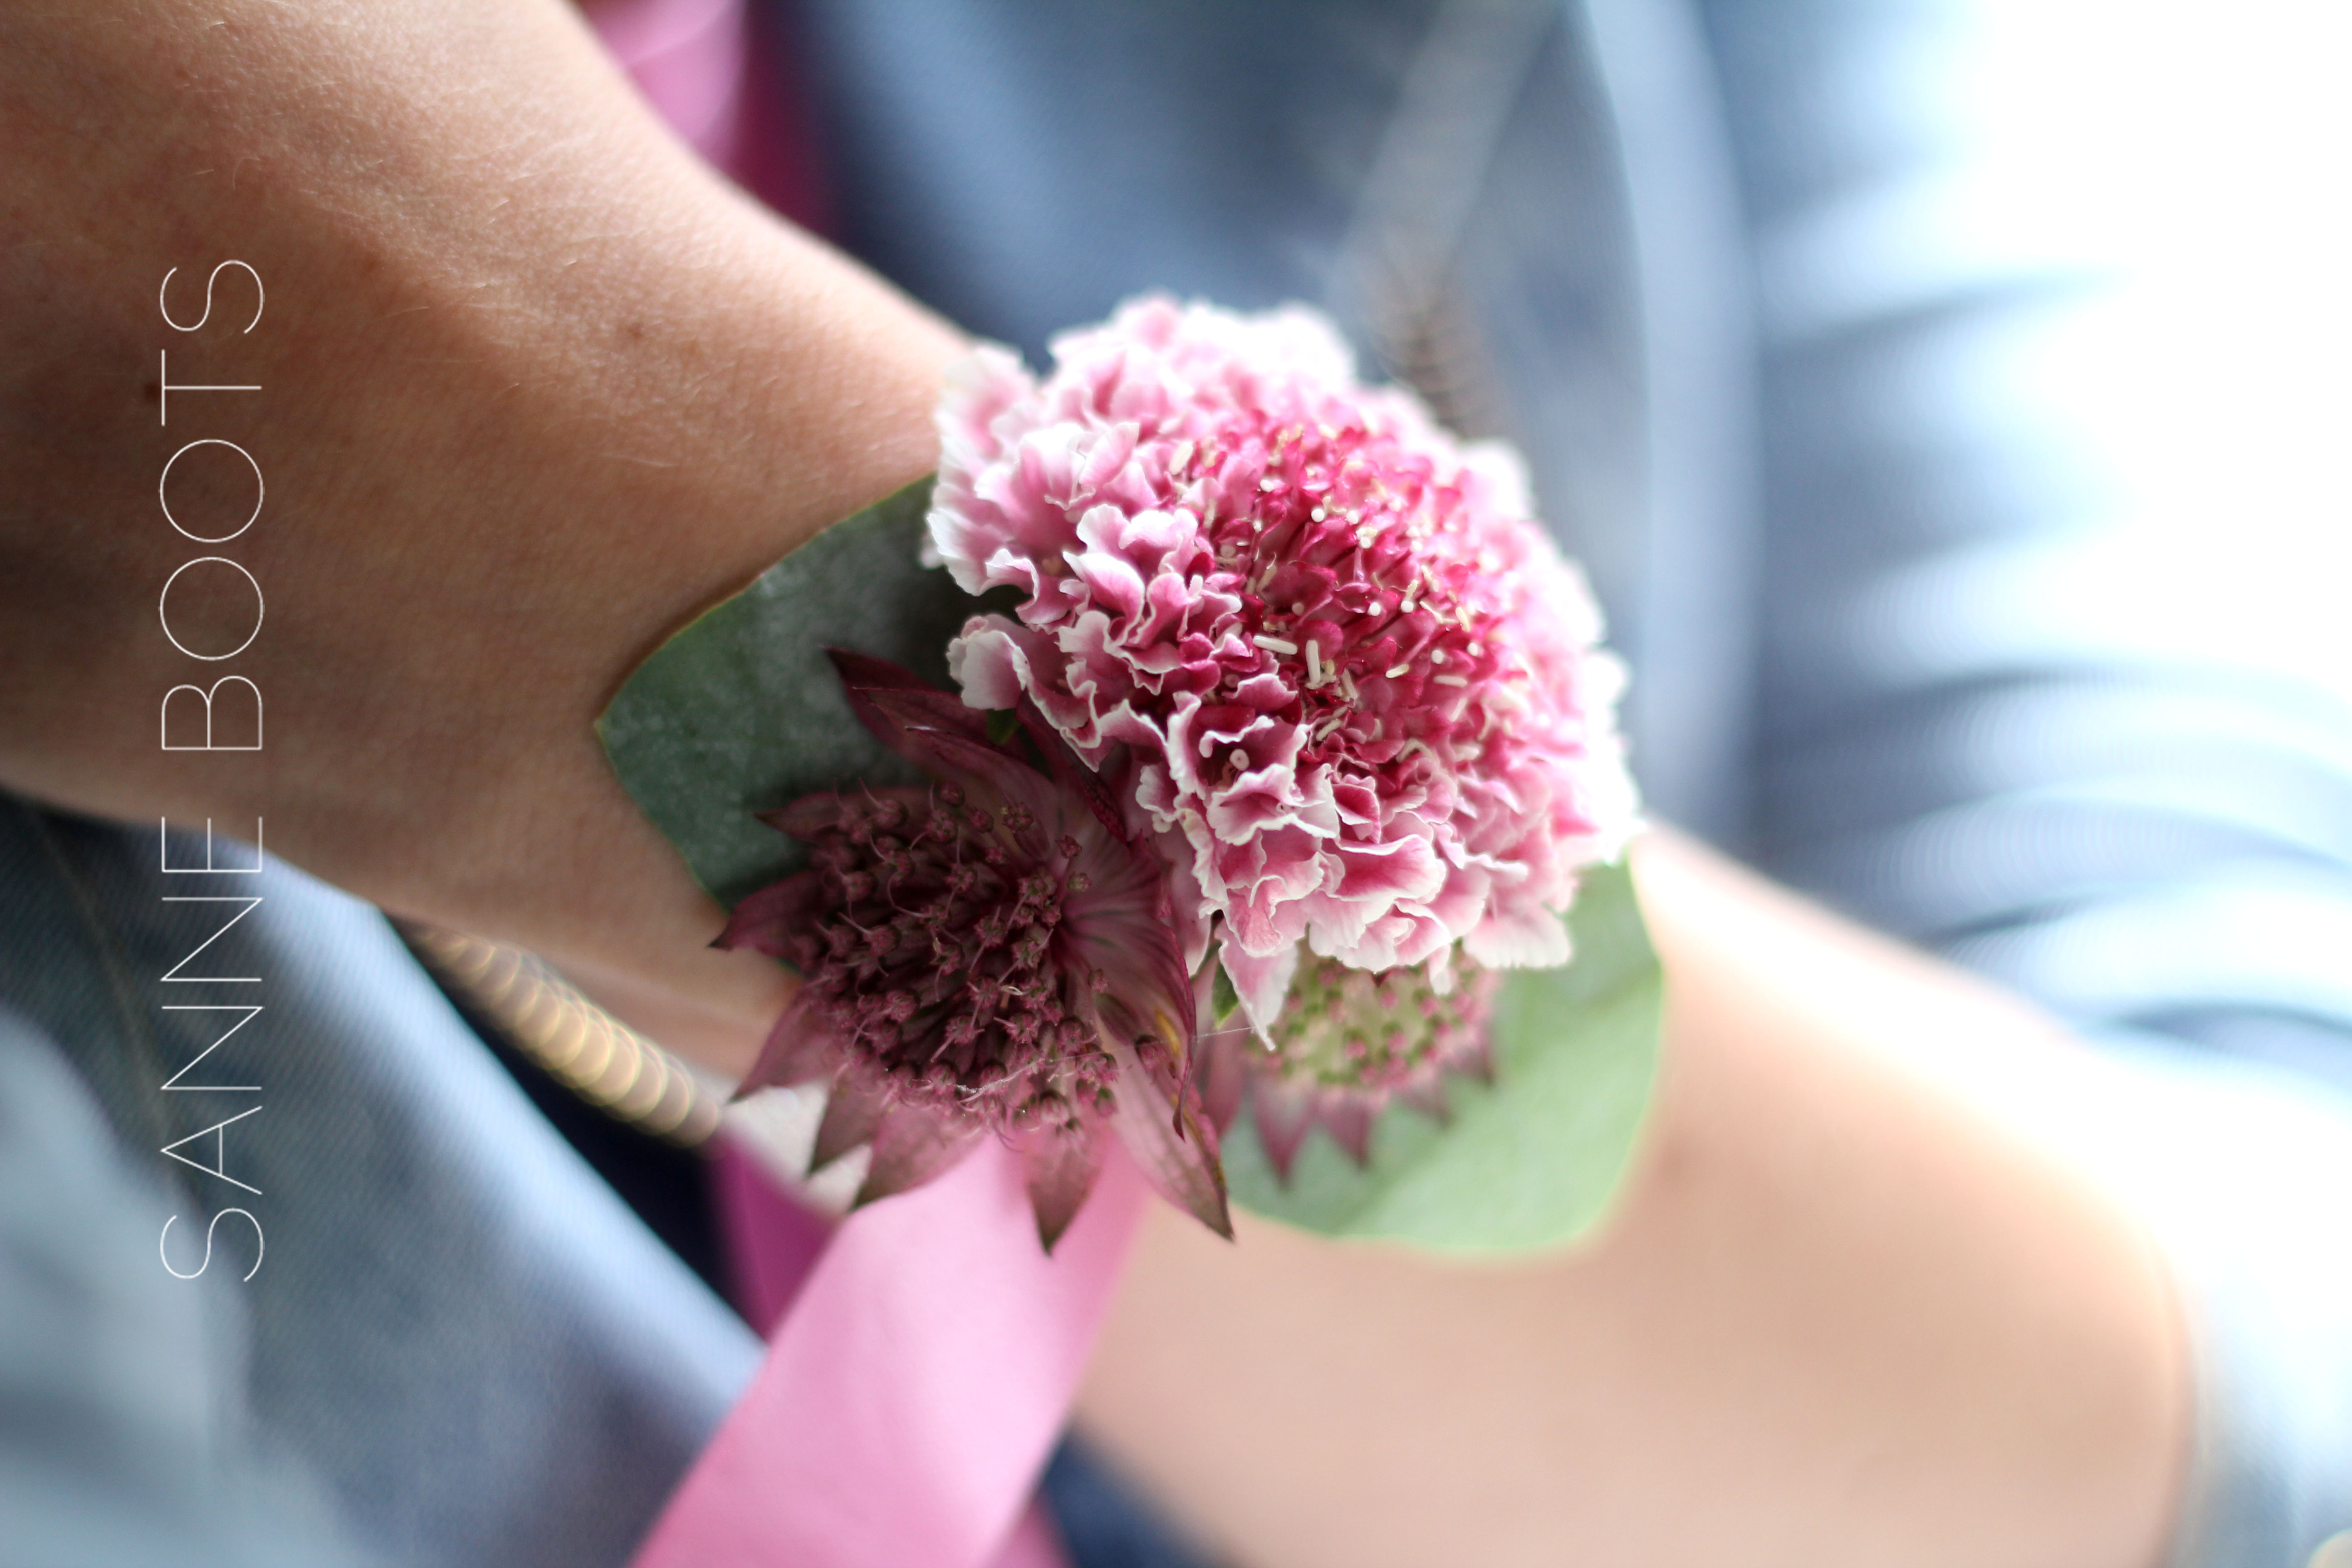 Polscorsage | Stevig, draagbaar en met prachtige bloemen!